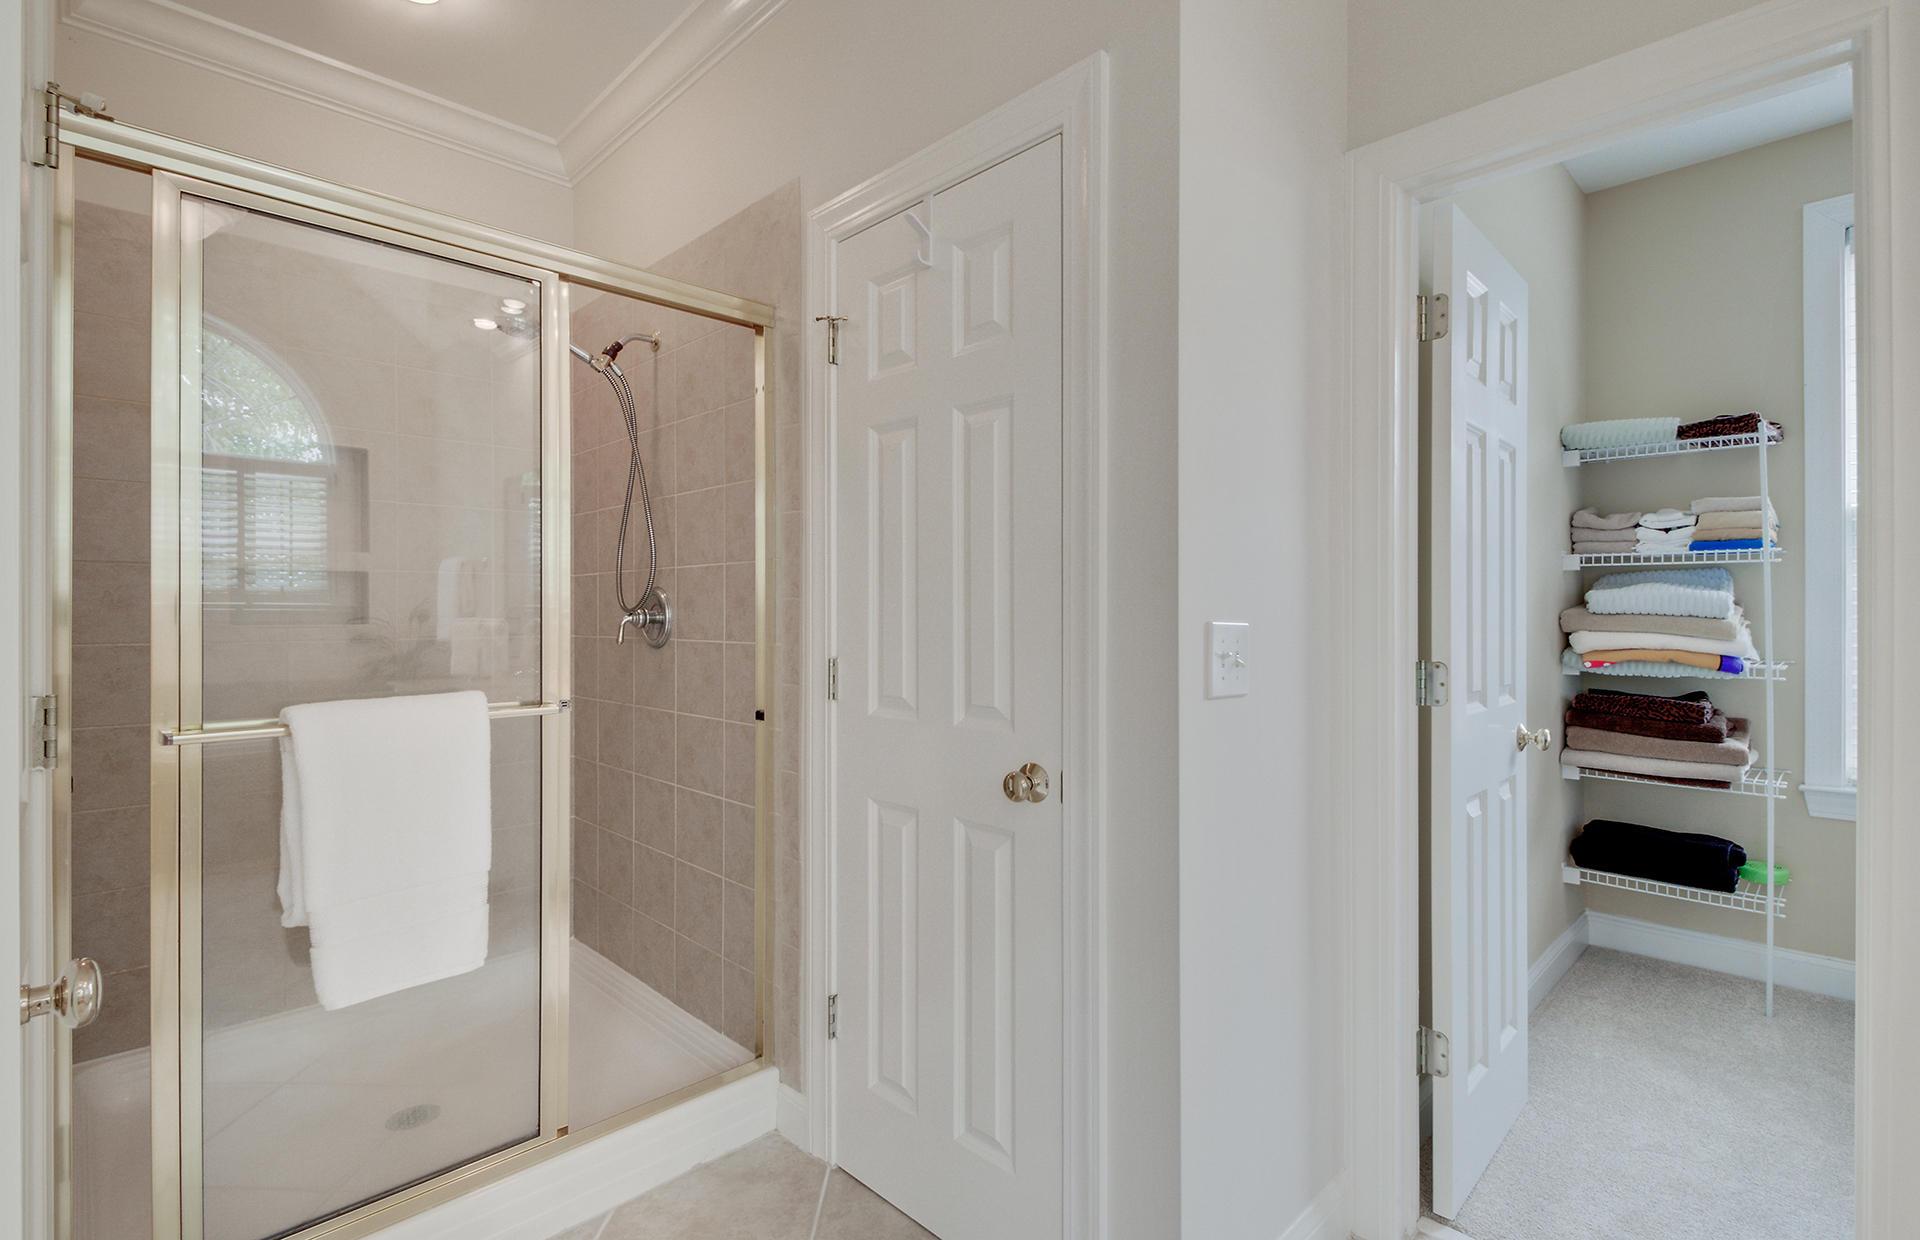 Dunes West Homes For Sale - 2453 Darts Cove, Mount Pleasant, SC - 30